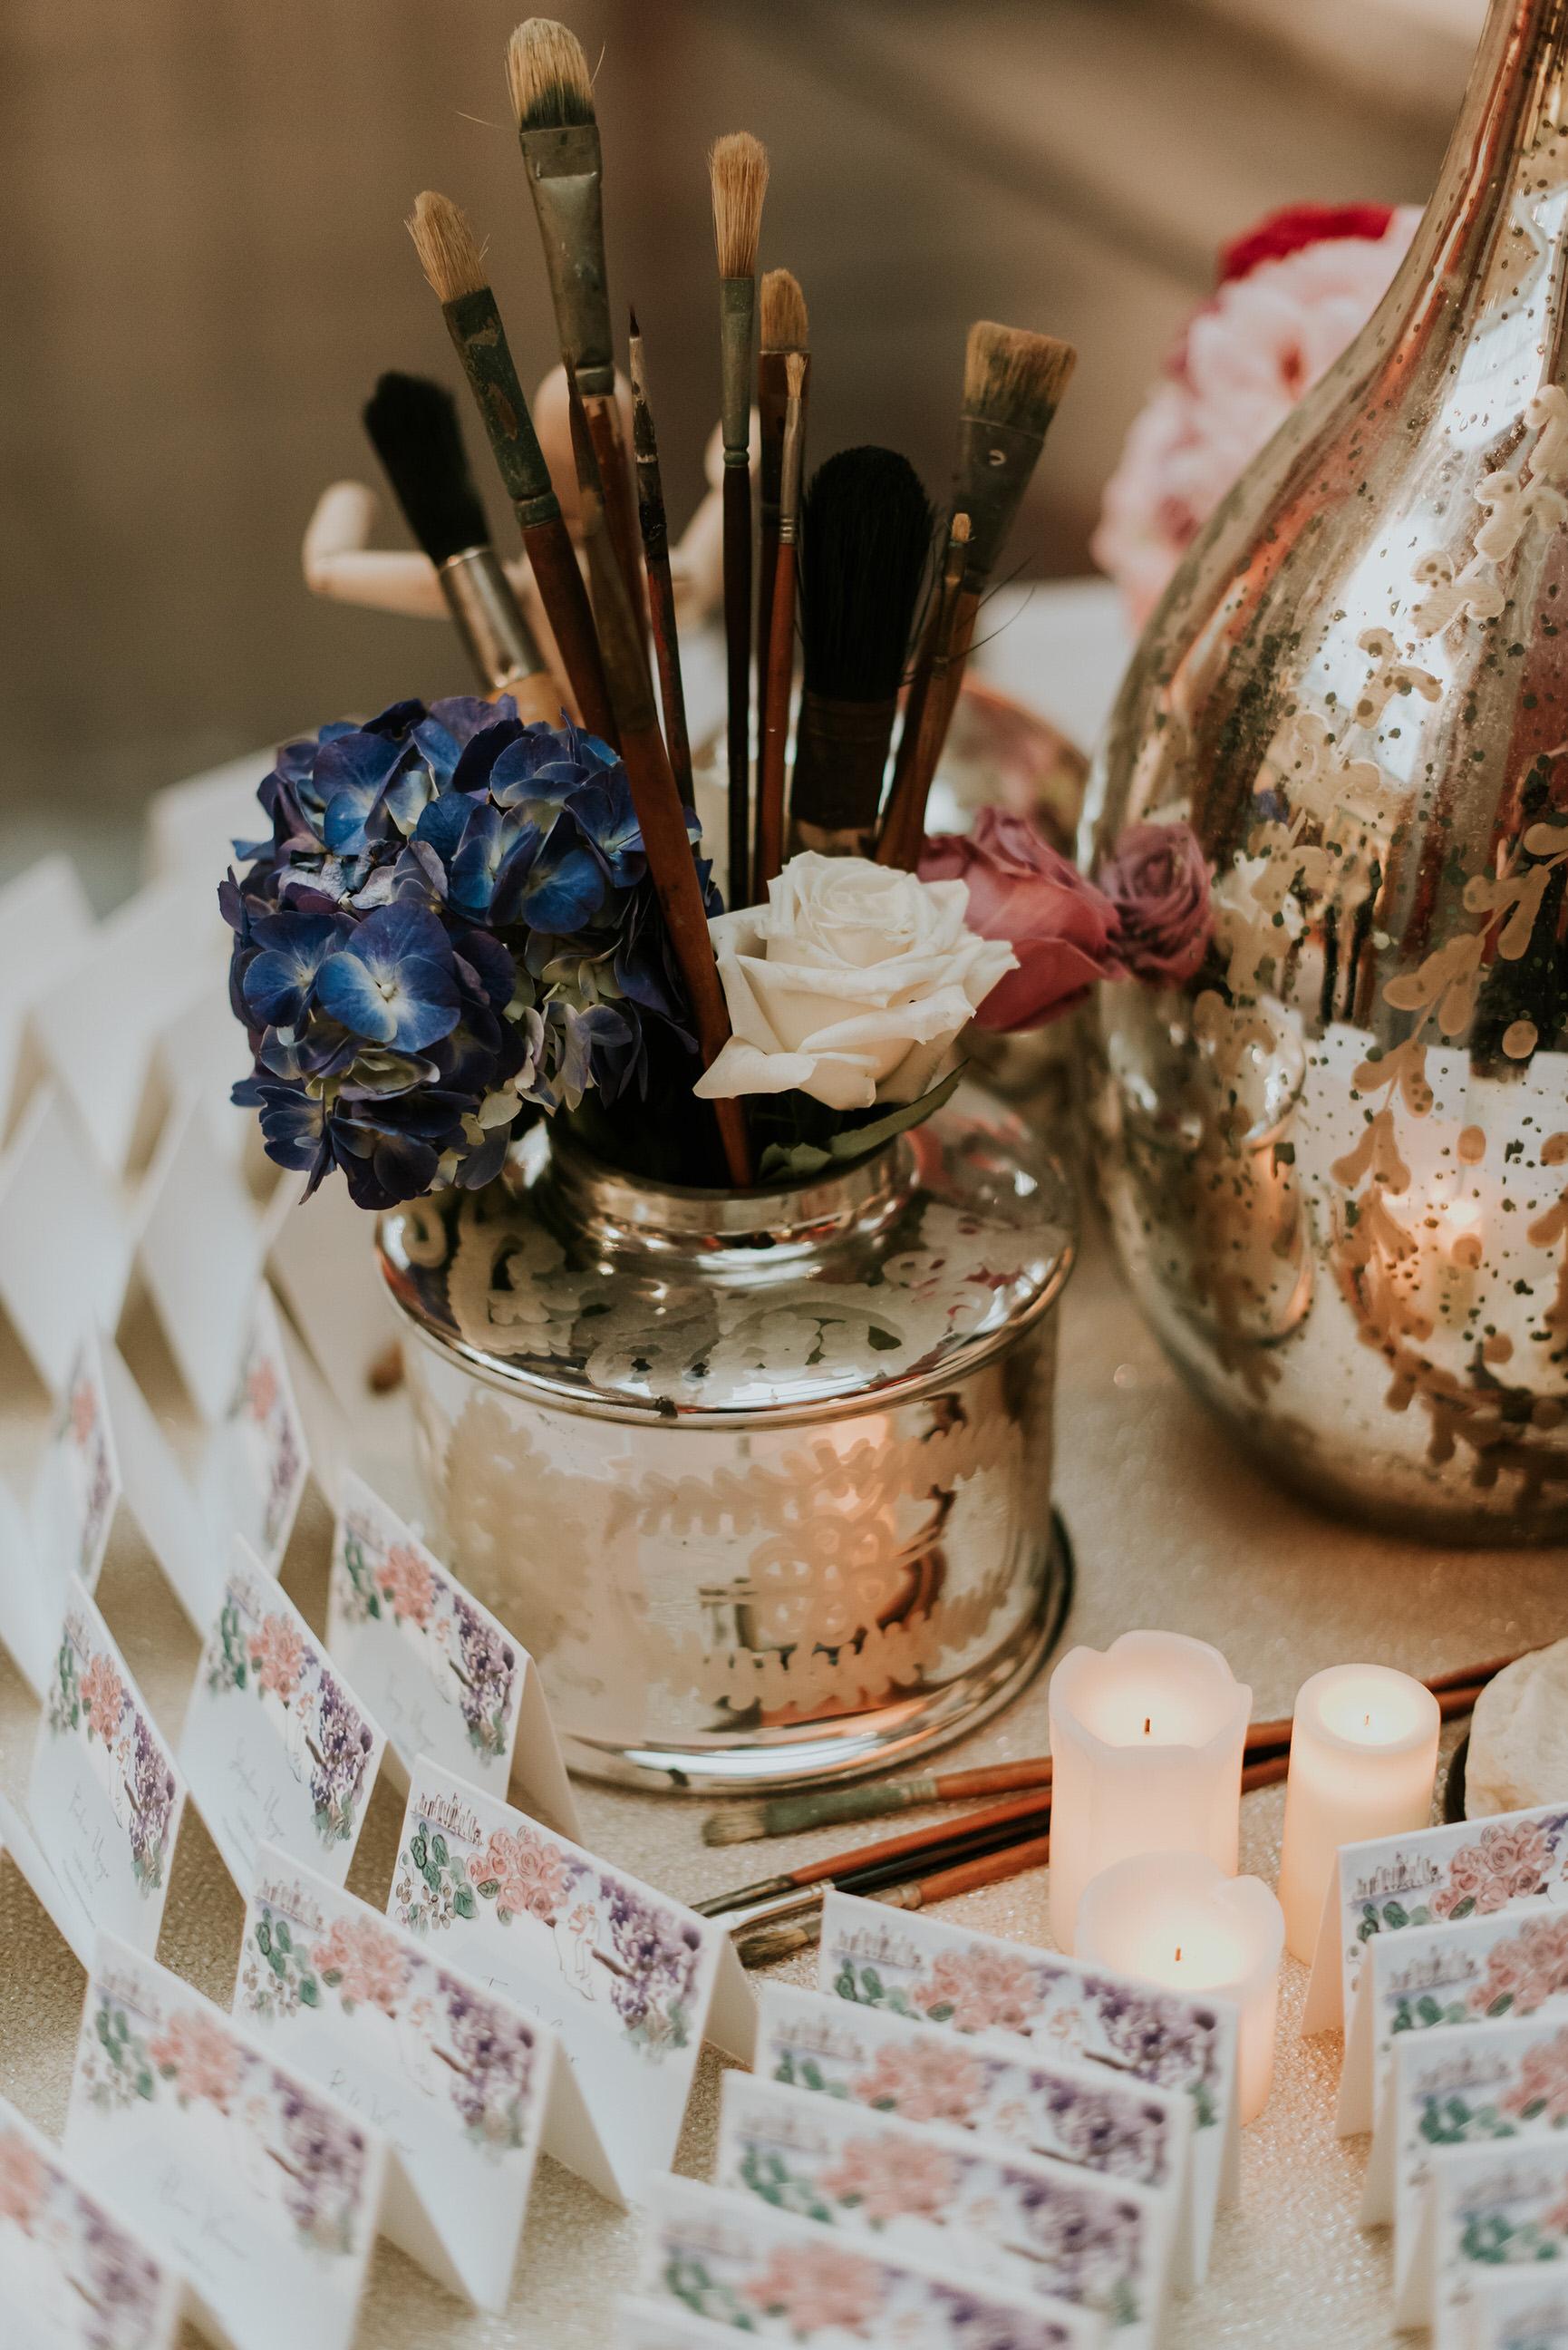 53 Blue Hydrangea Pink Rose Lavender Rose Paintbrushes Mercury Glass Art Museum Wedding.jpg